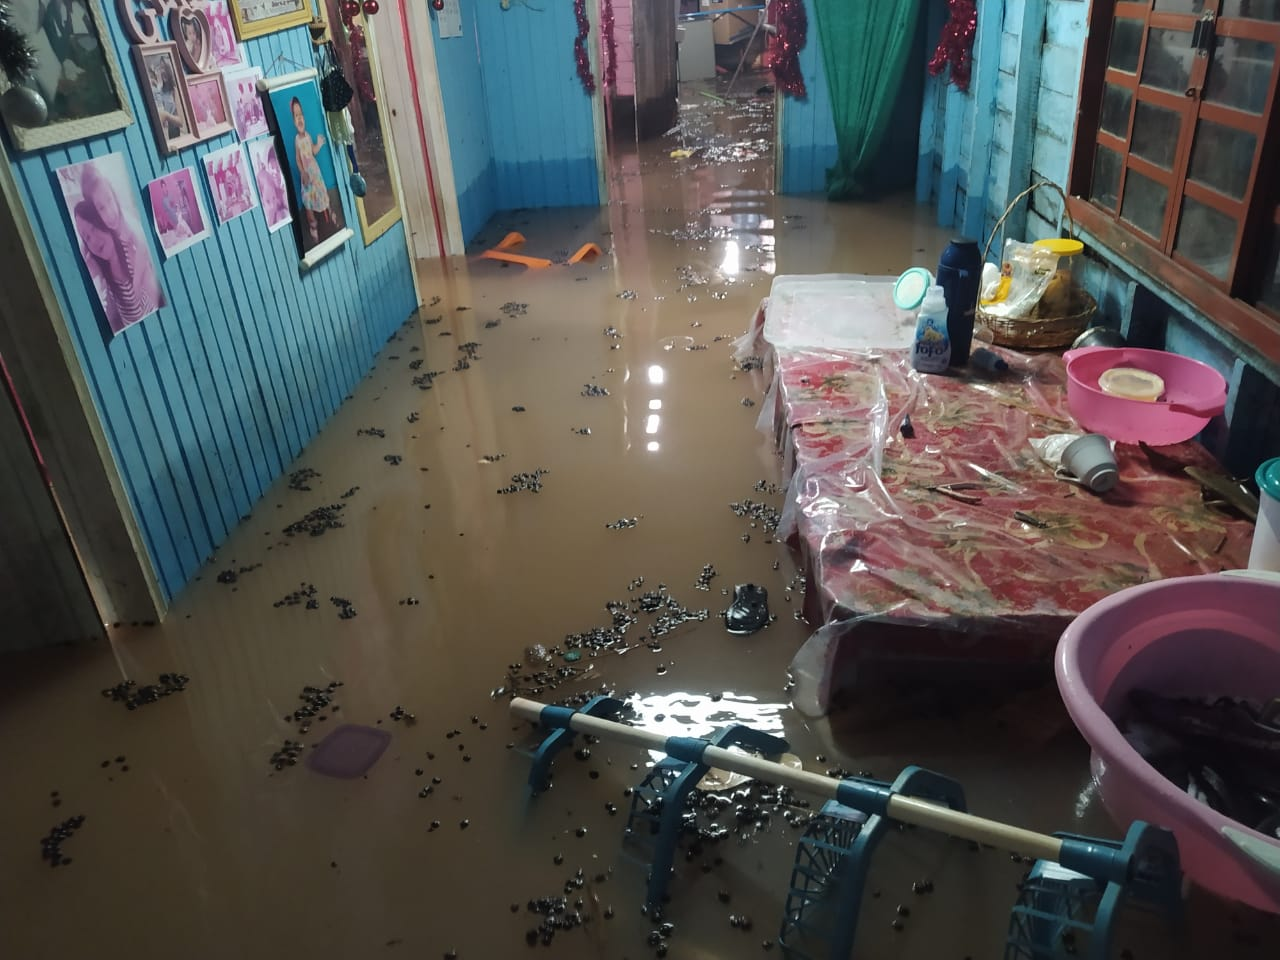 Casa de moradora do bairro Jardim Marco Zero alaga durante temporal. Foto: Núbia Pacheco.